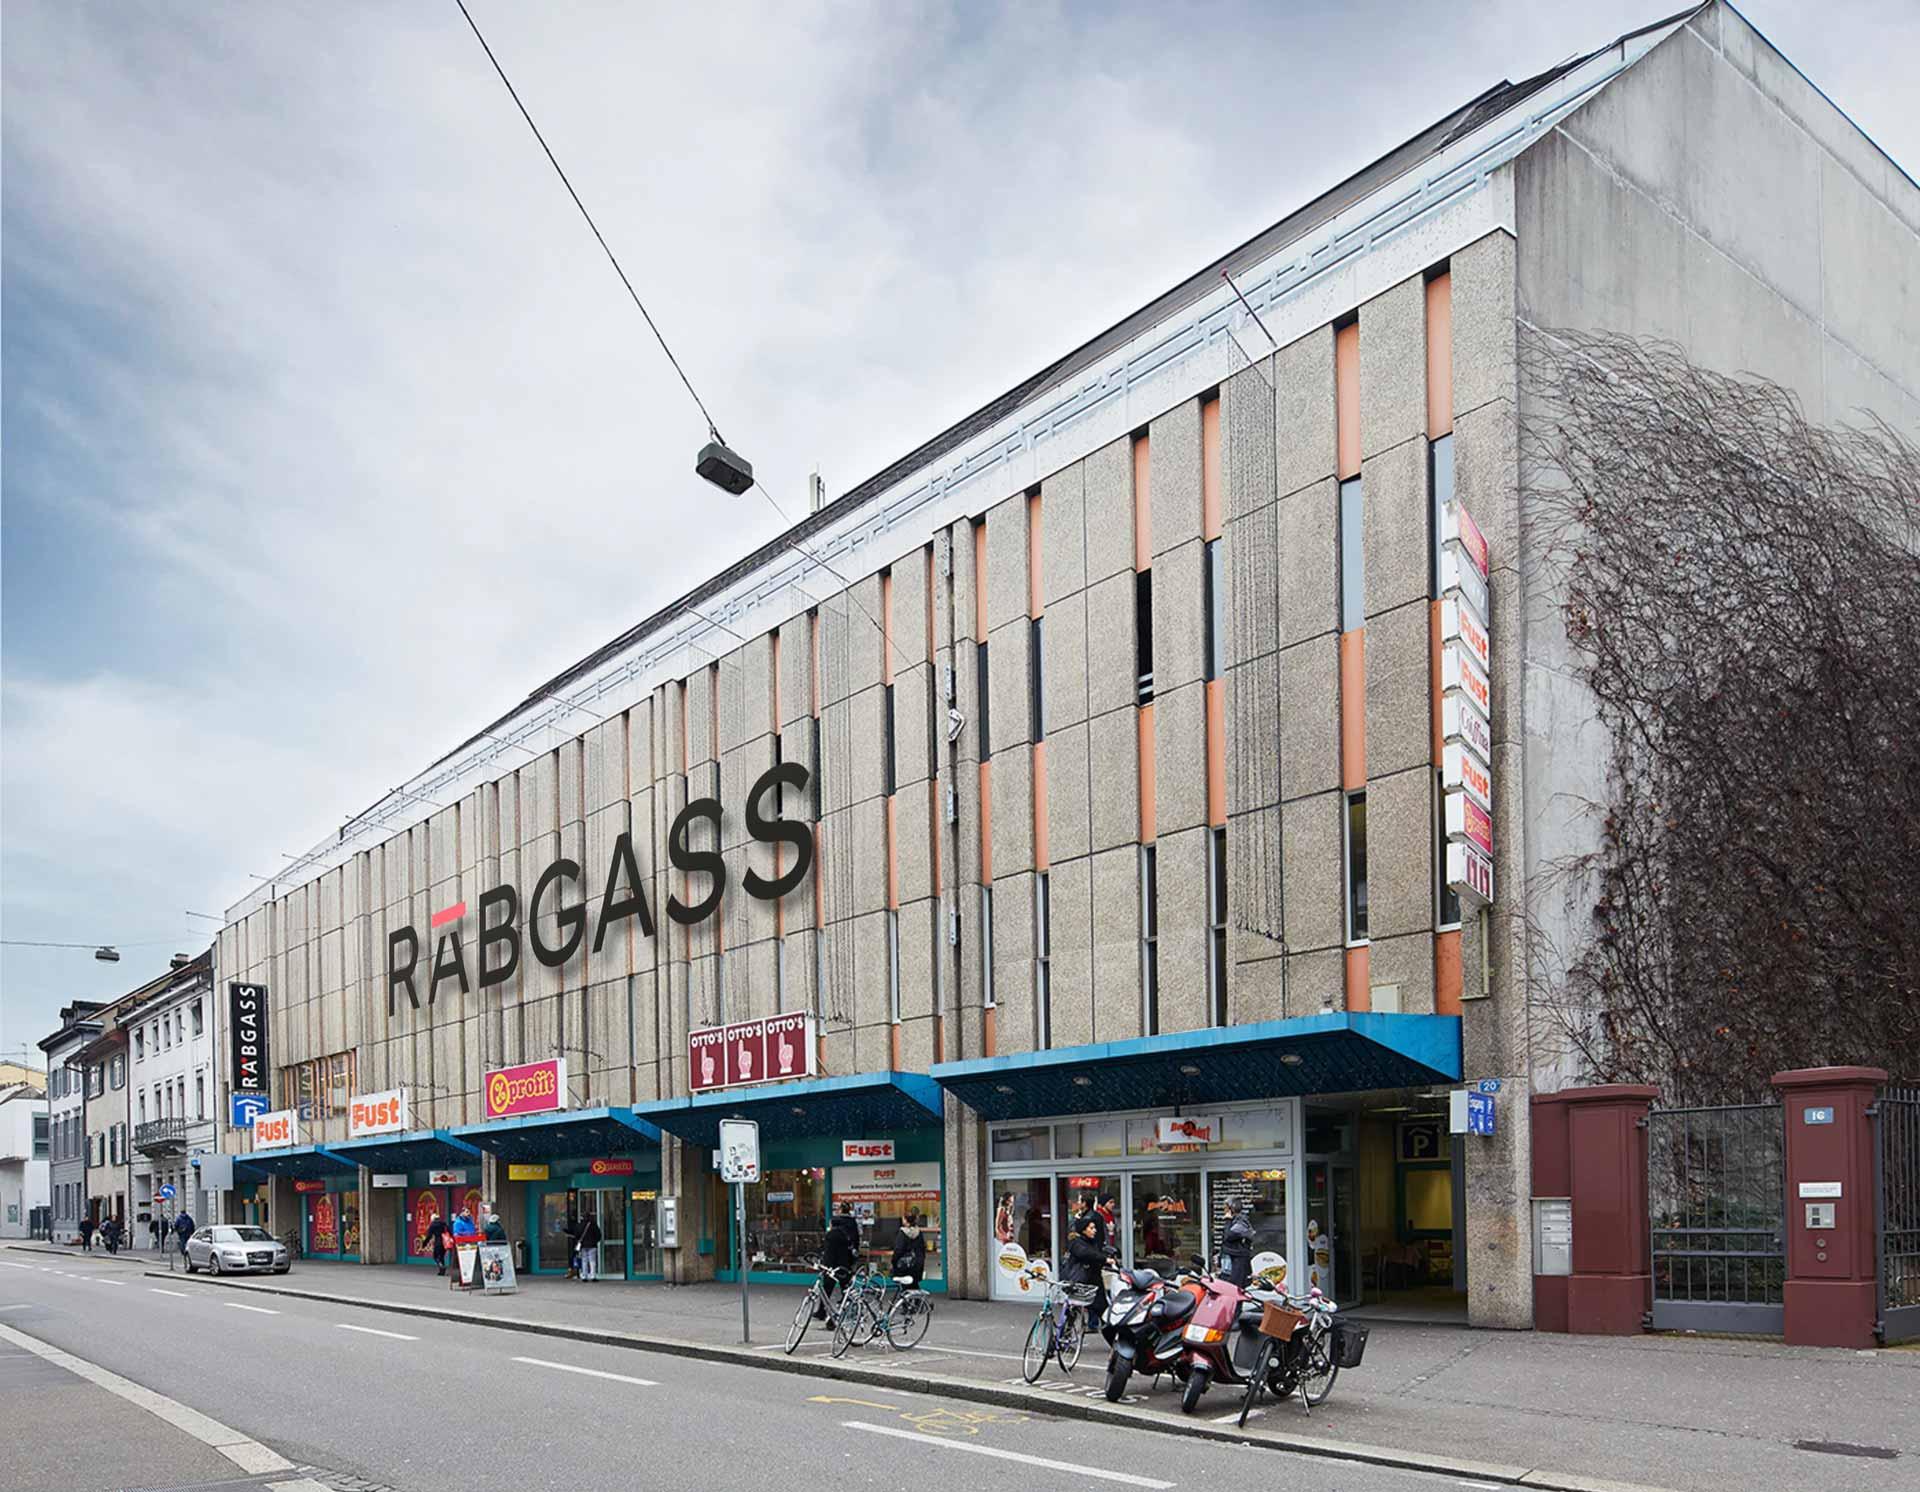 Räbgass Center